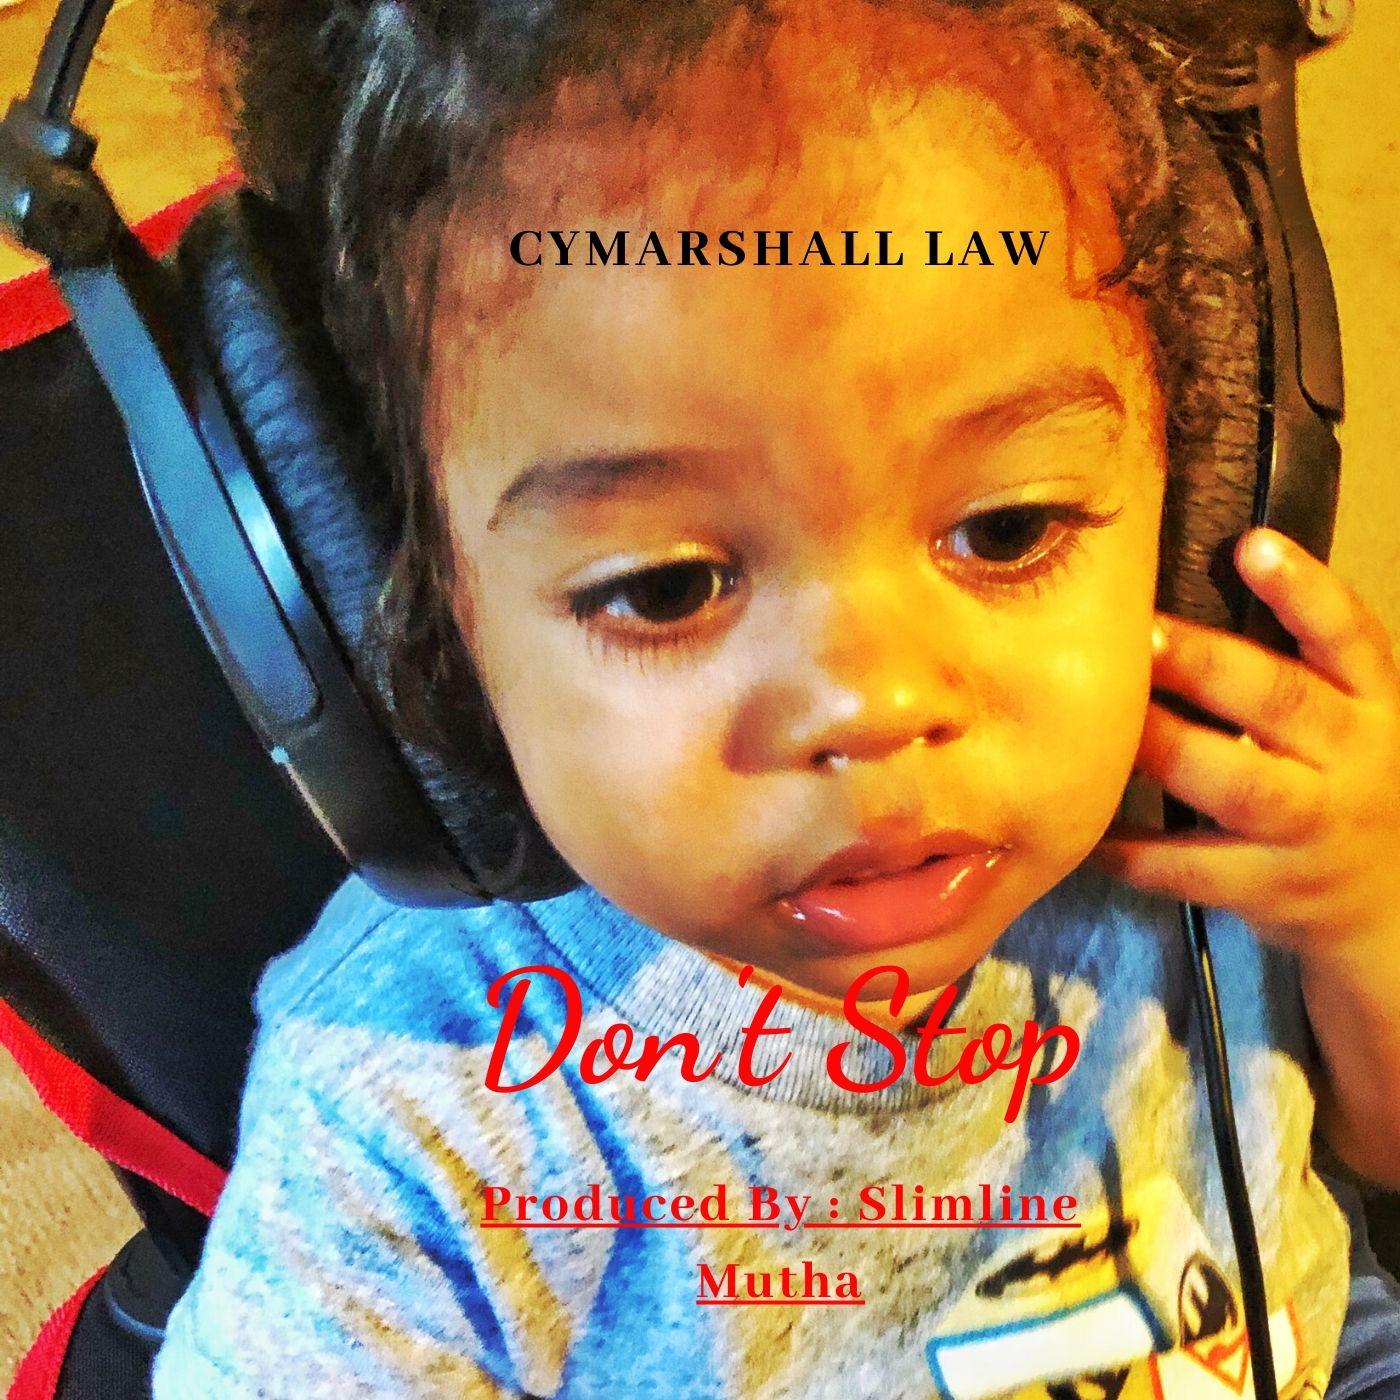 Cymarshall Law - Don't Stop